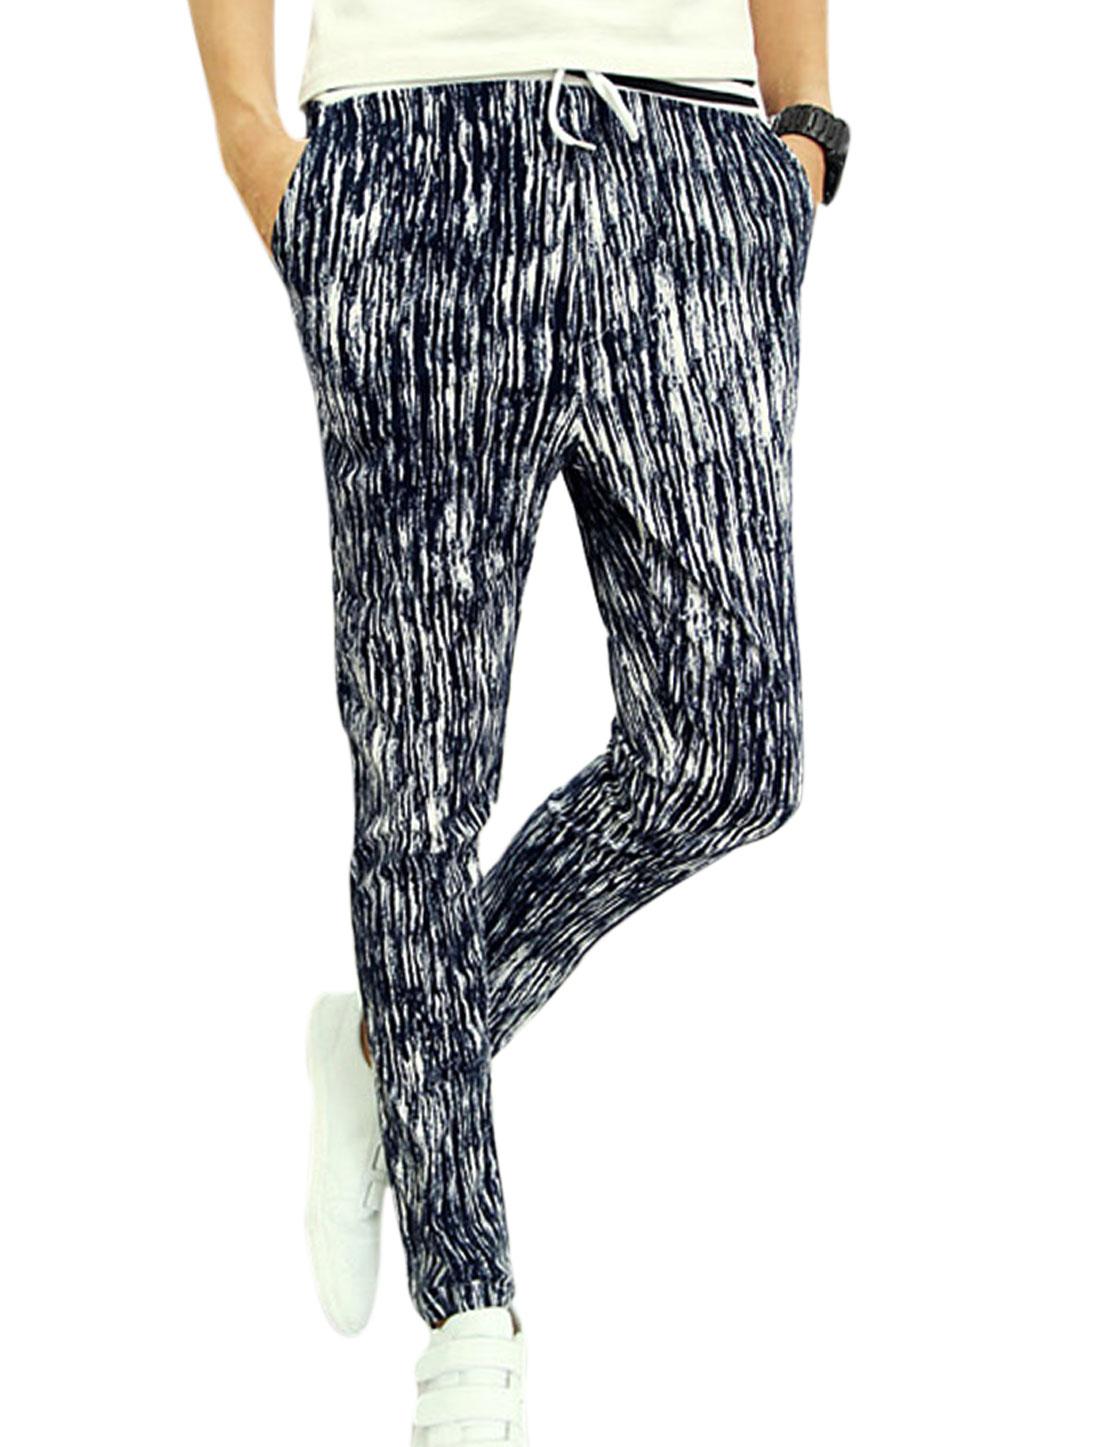 Men Elastic Wasit Stripes Tie-Dye Design Skinny Newly Pants Navy Blue White W28